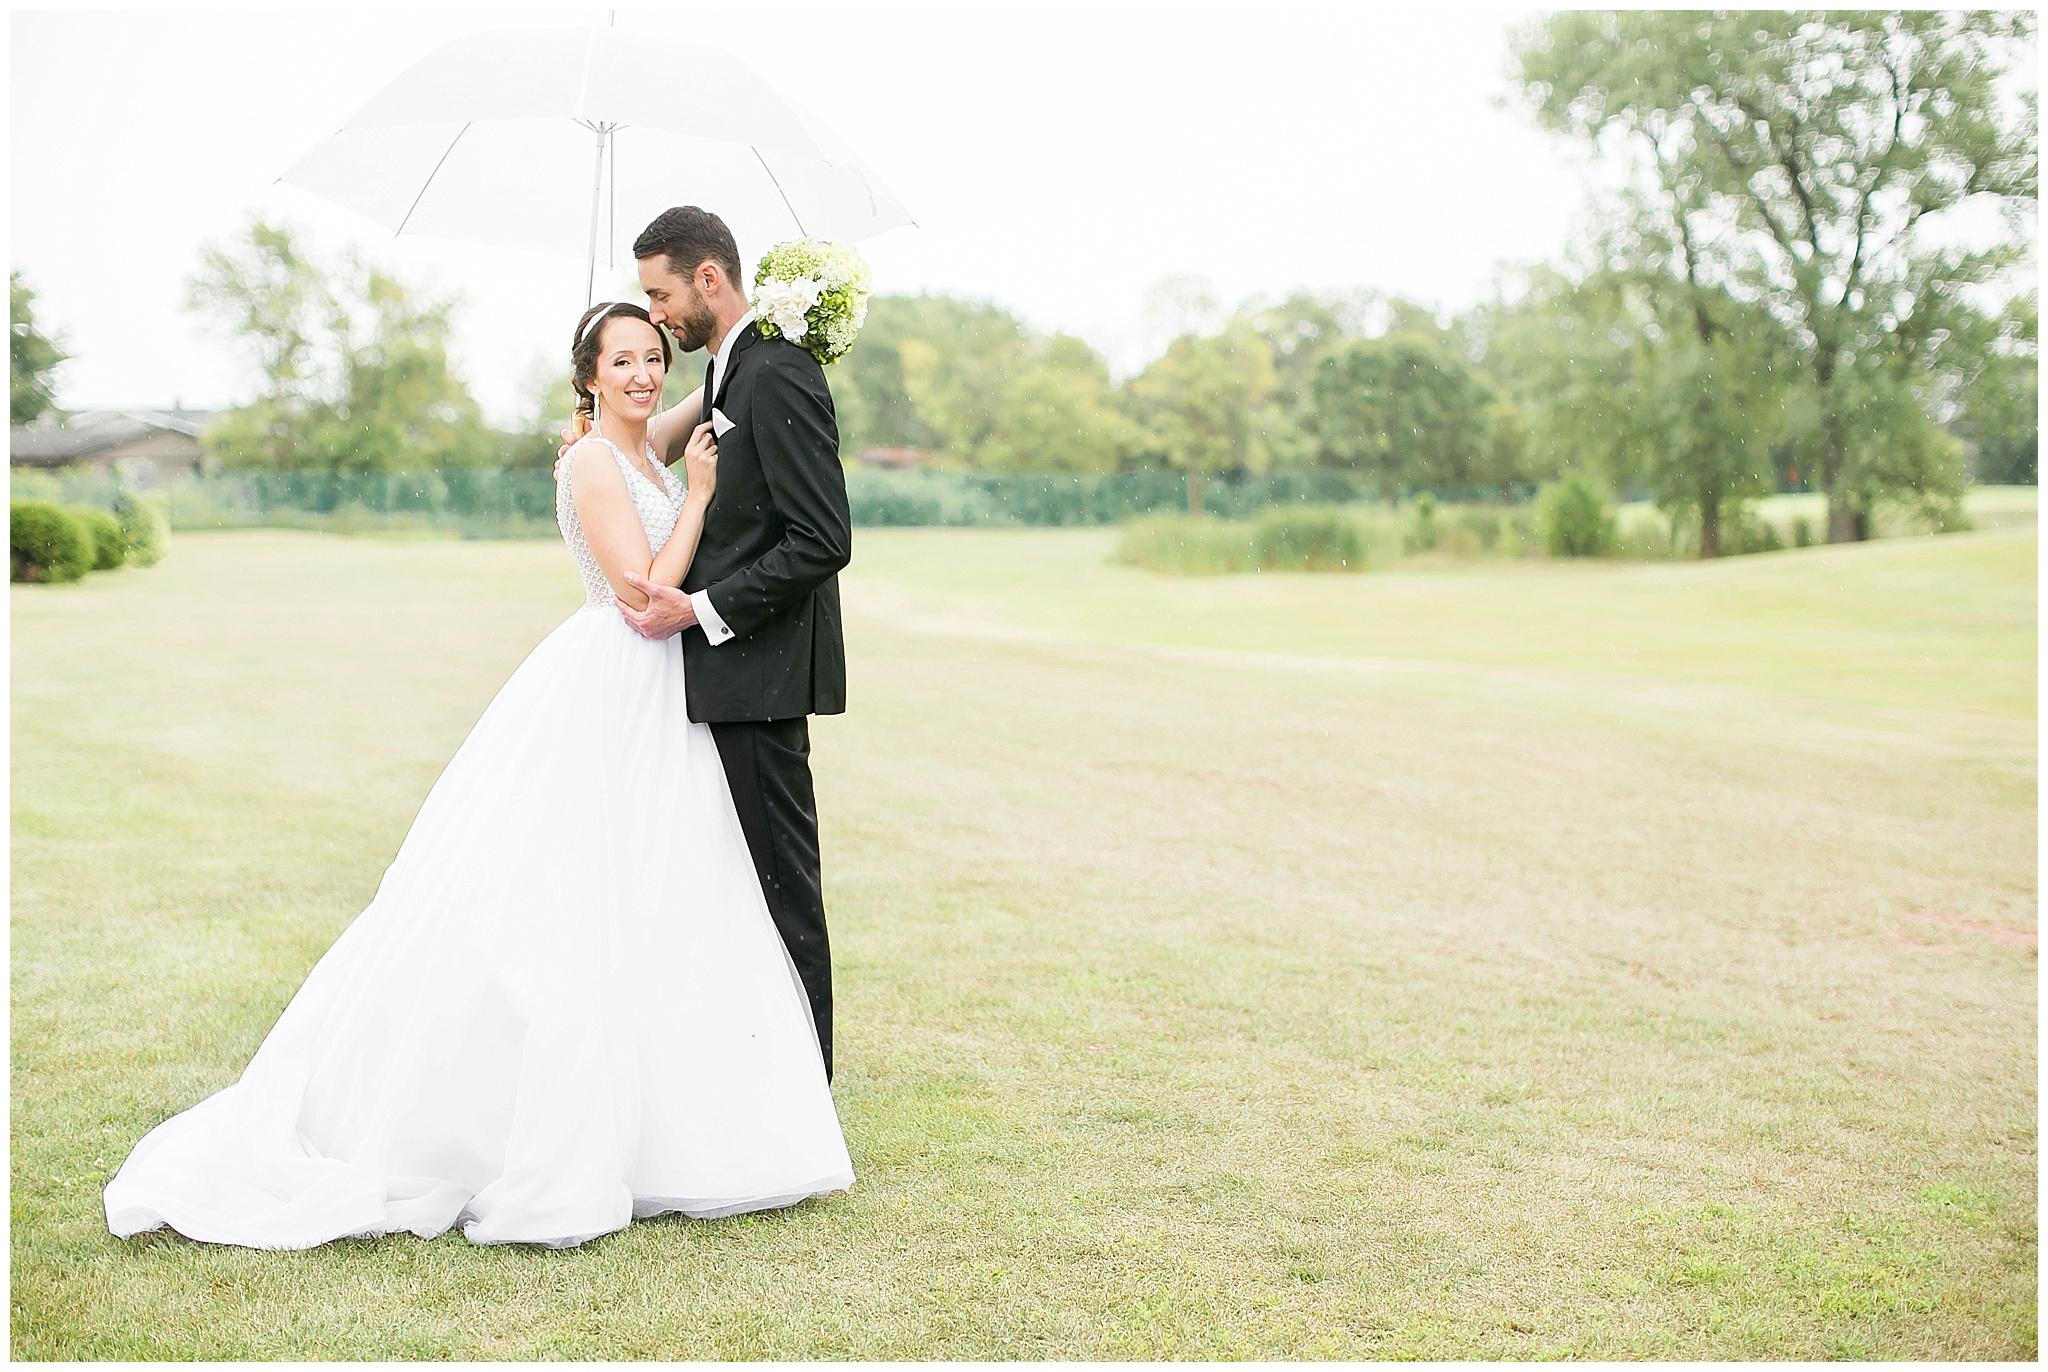 bridgewood_resort_wedding_neenah_wisconsin_0329.jpg